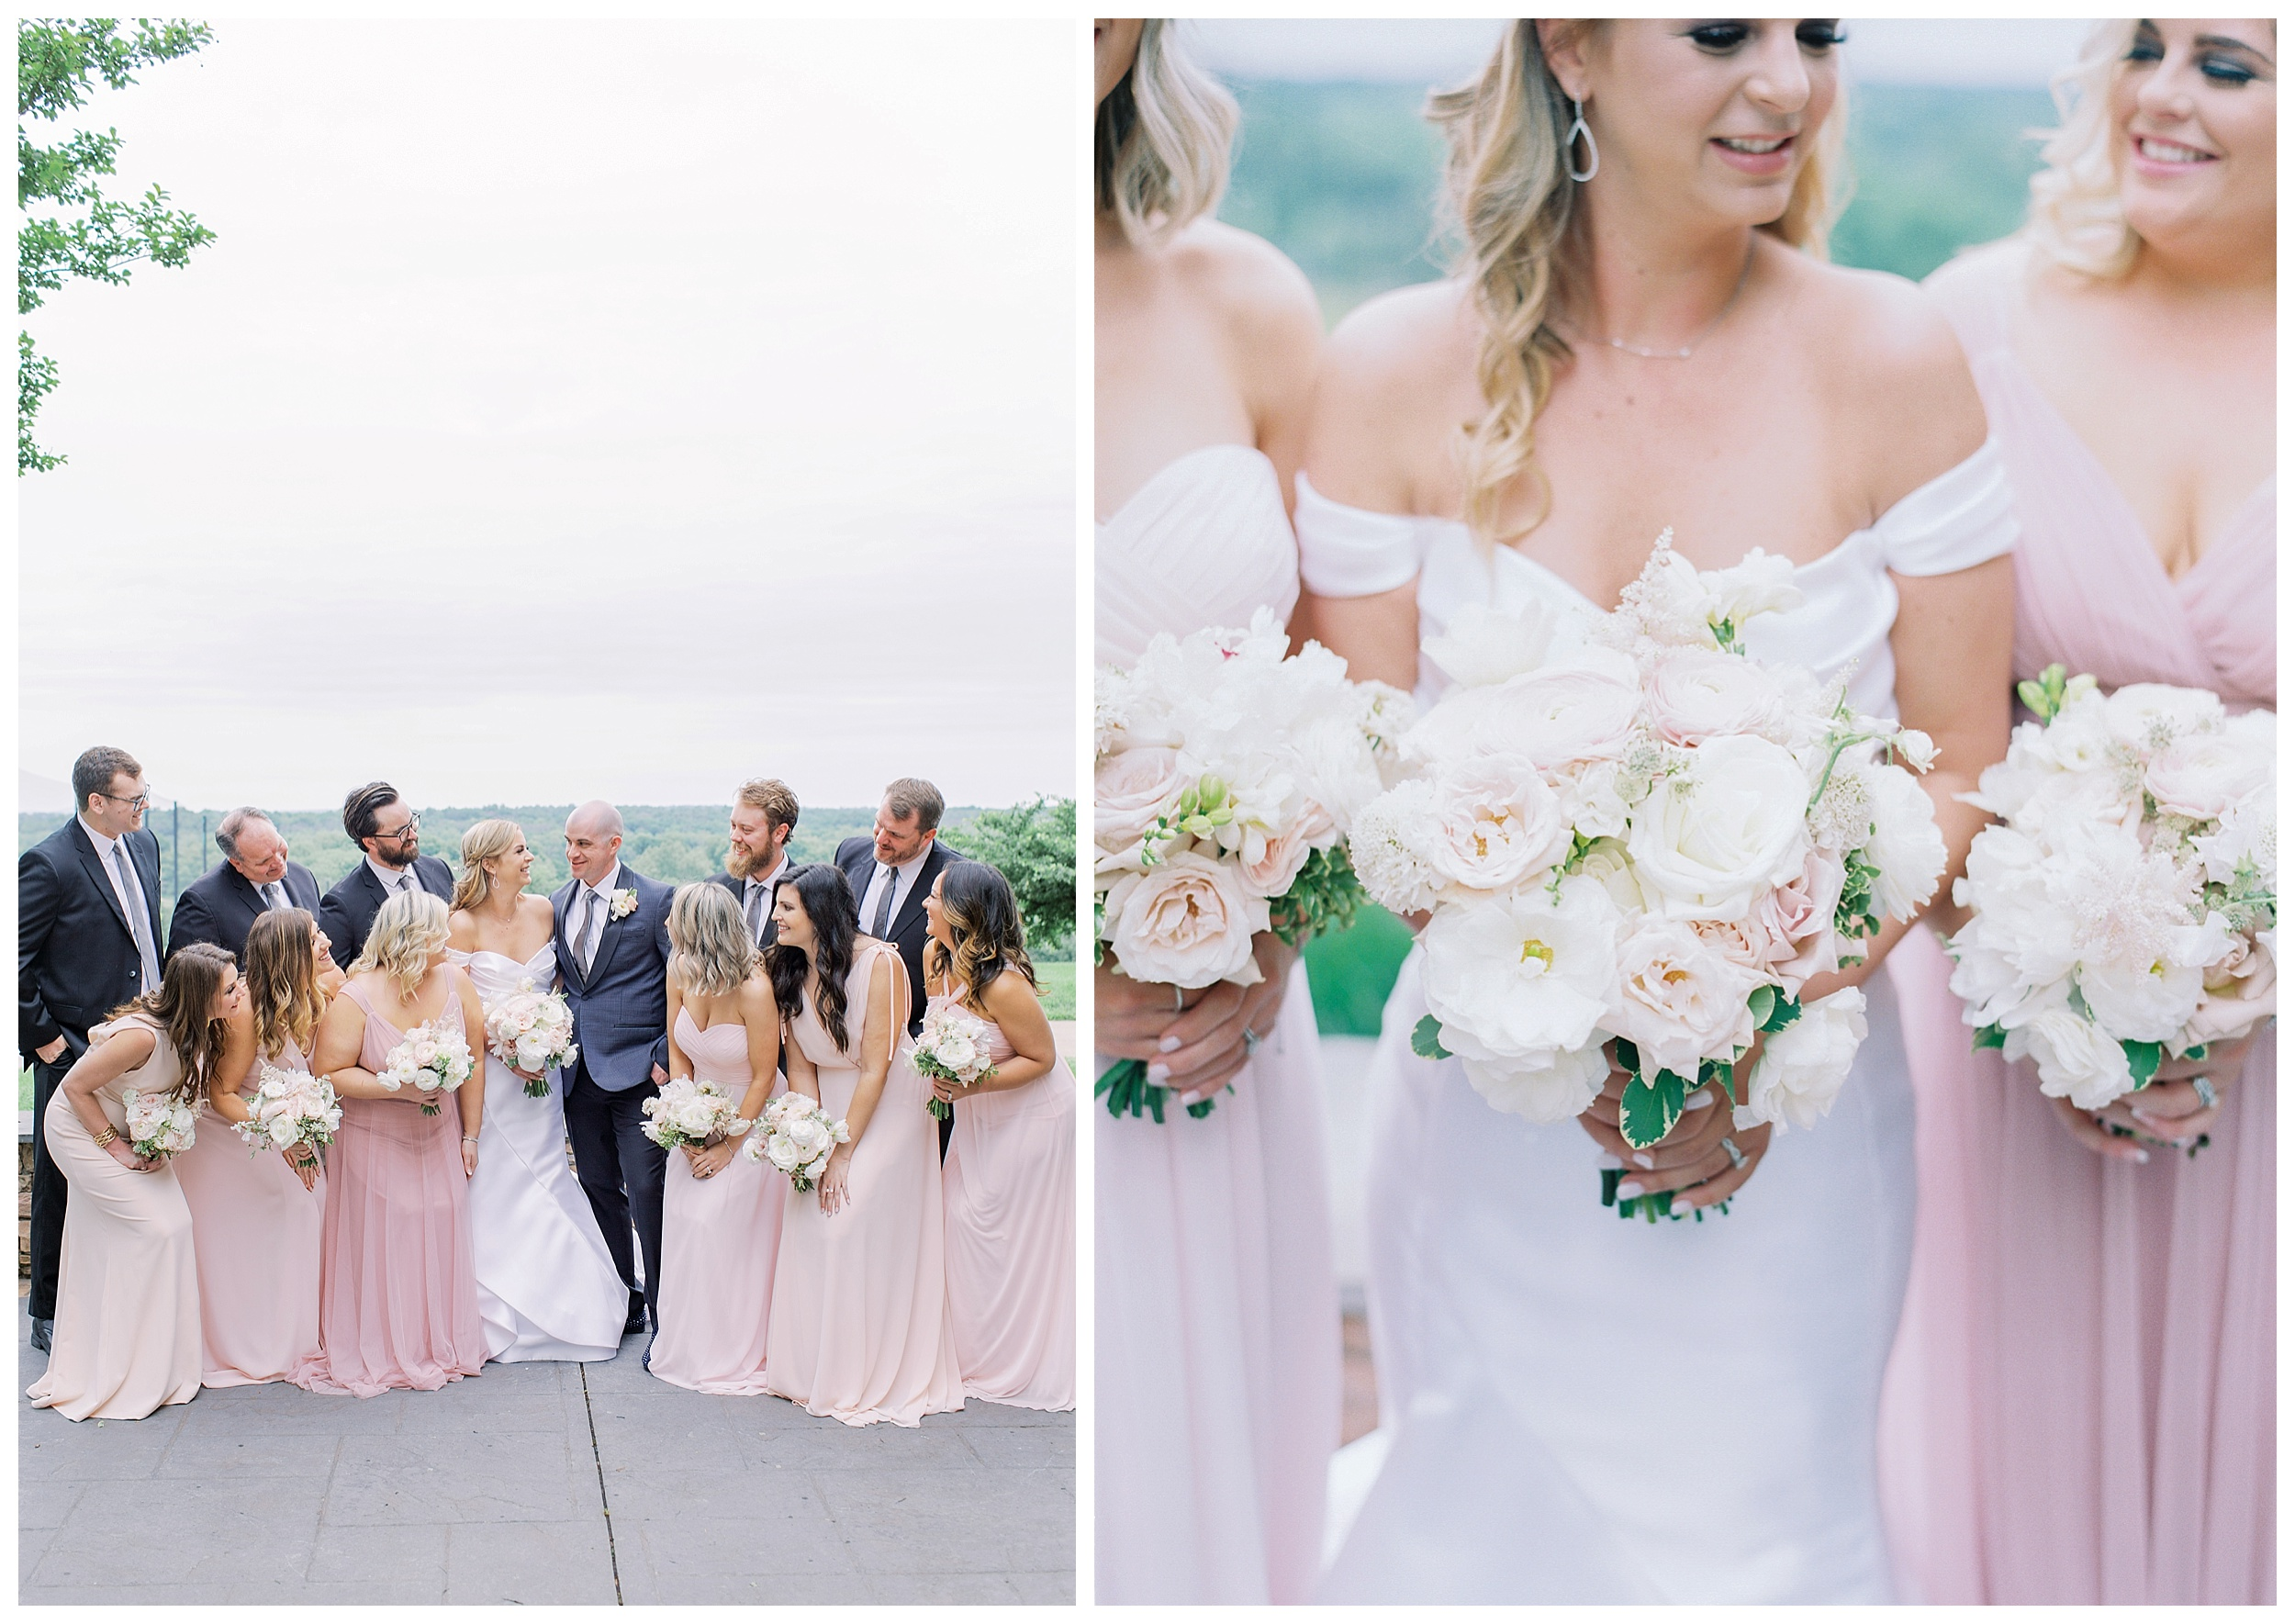 Lansdowne Resort Wedding | Virginia Film Wedding Photographer Kir Tuben_0052.jpg